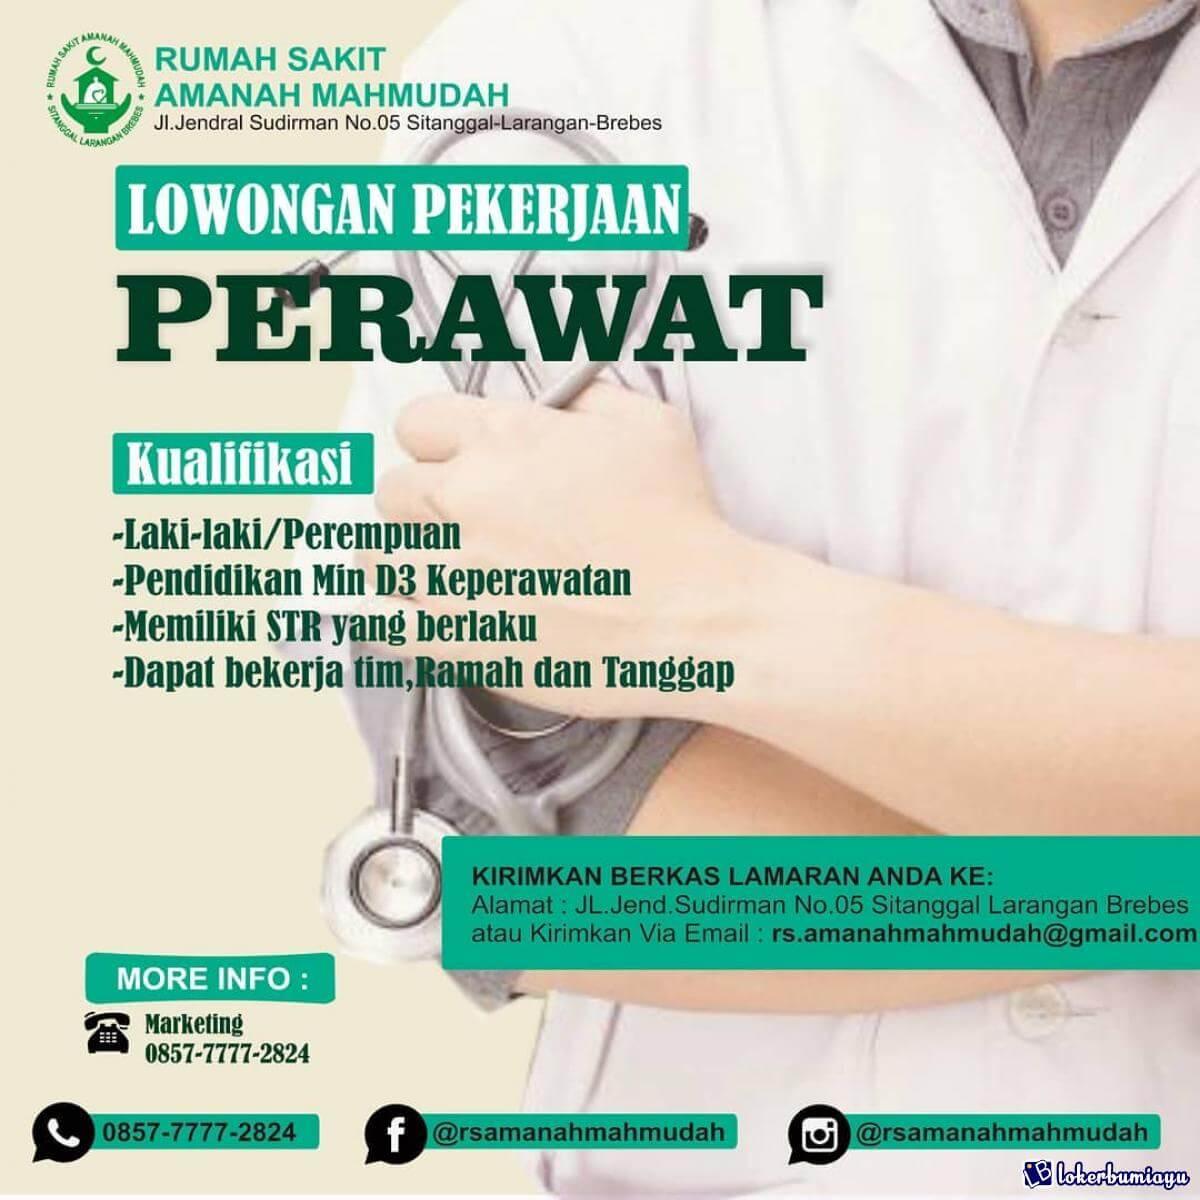 RS Amanah Mahmudah Brebes